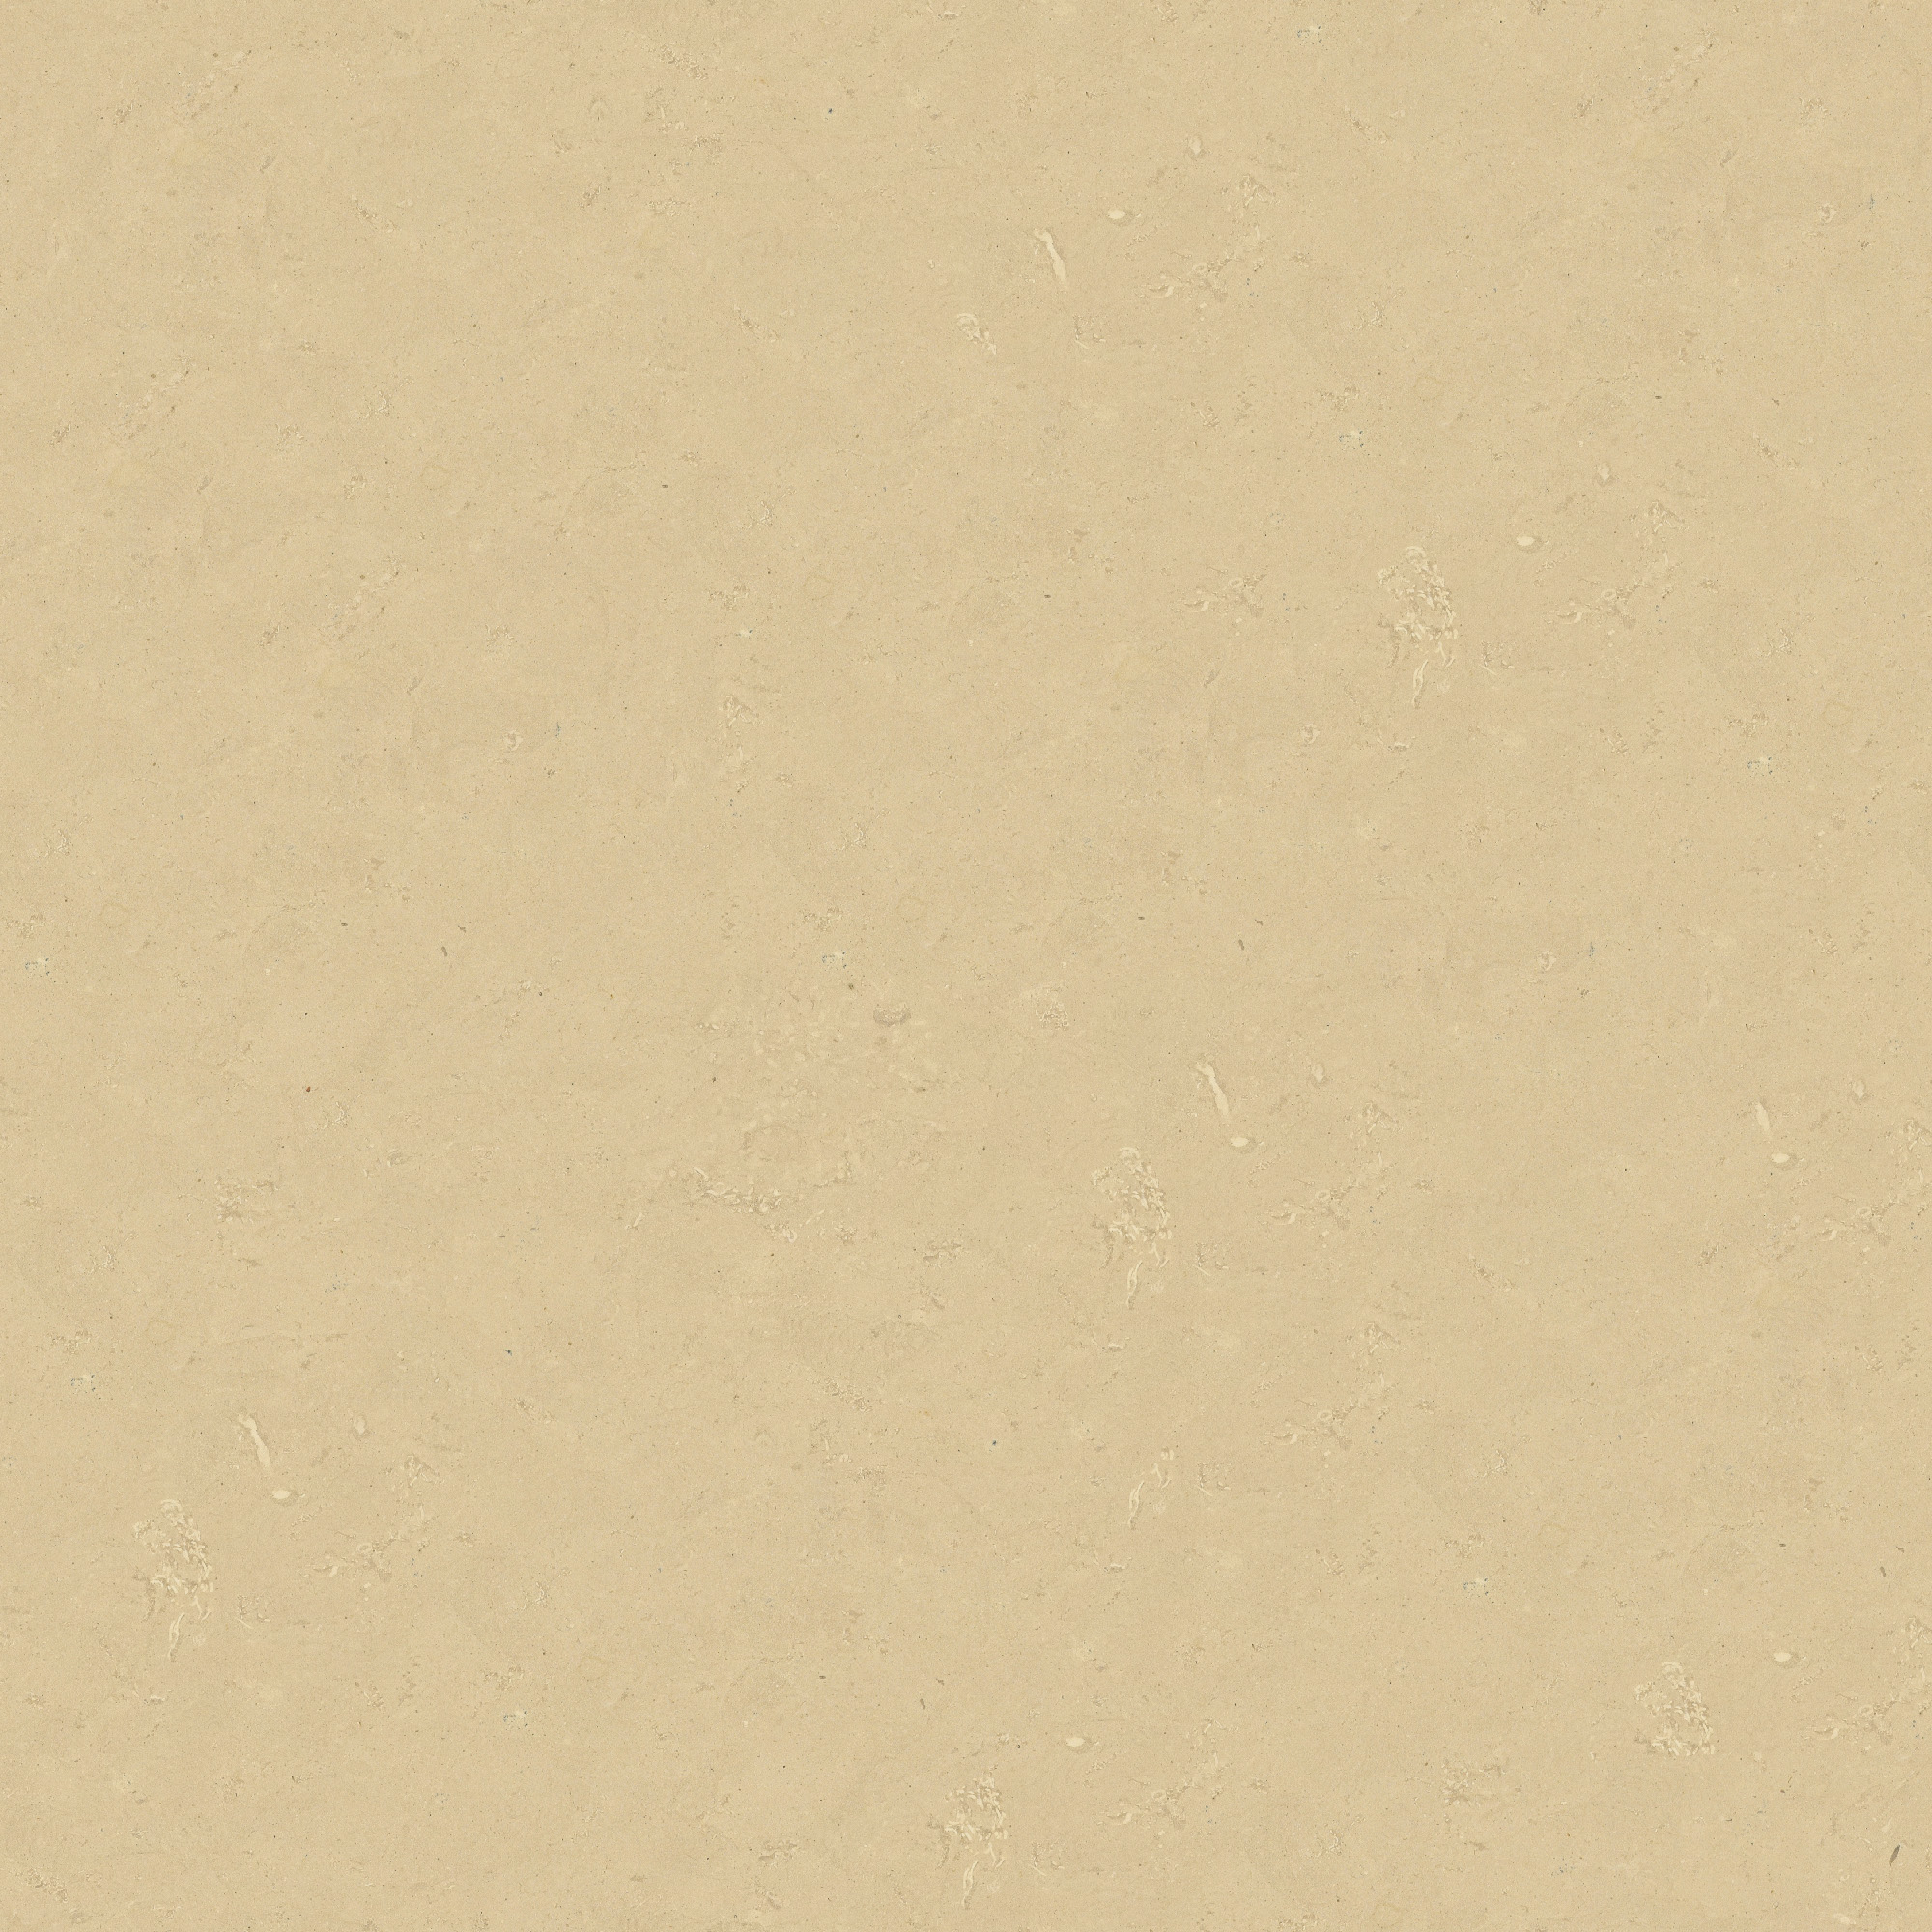 granada beige.jpg